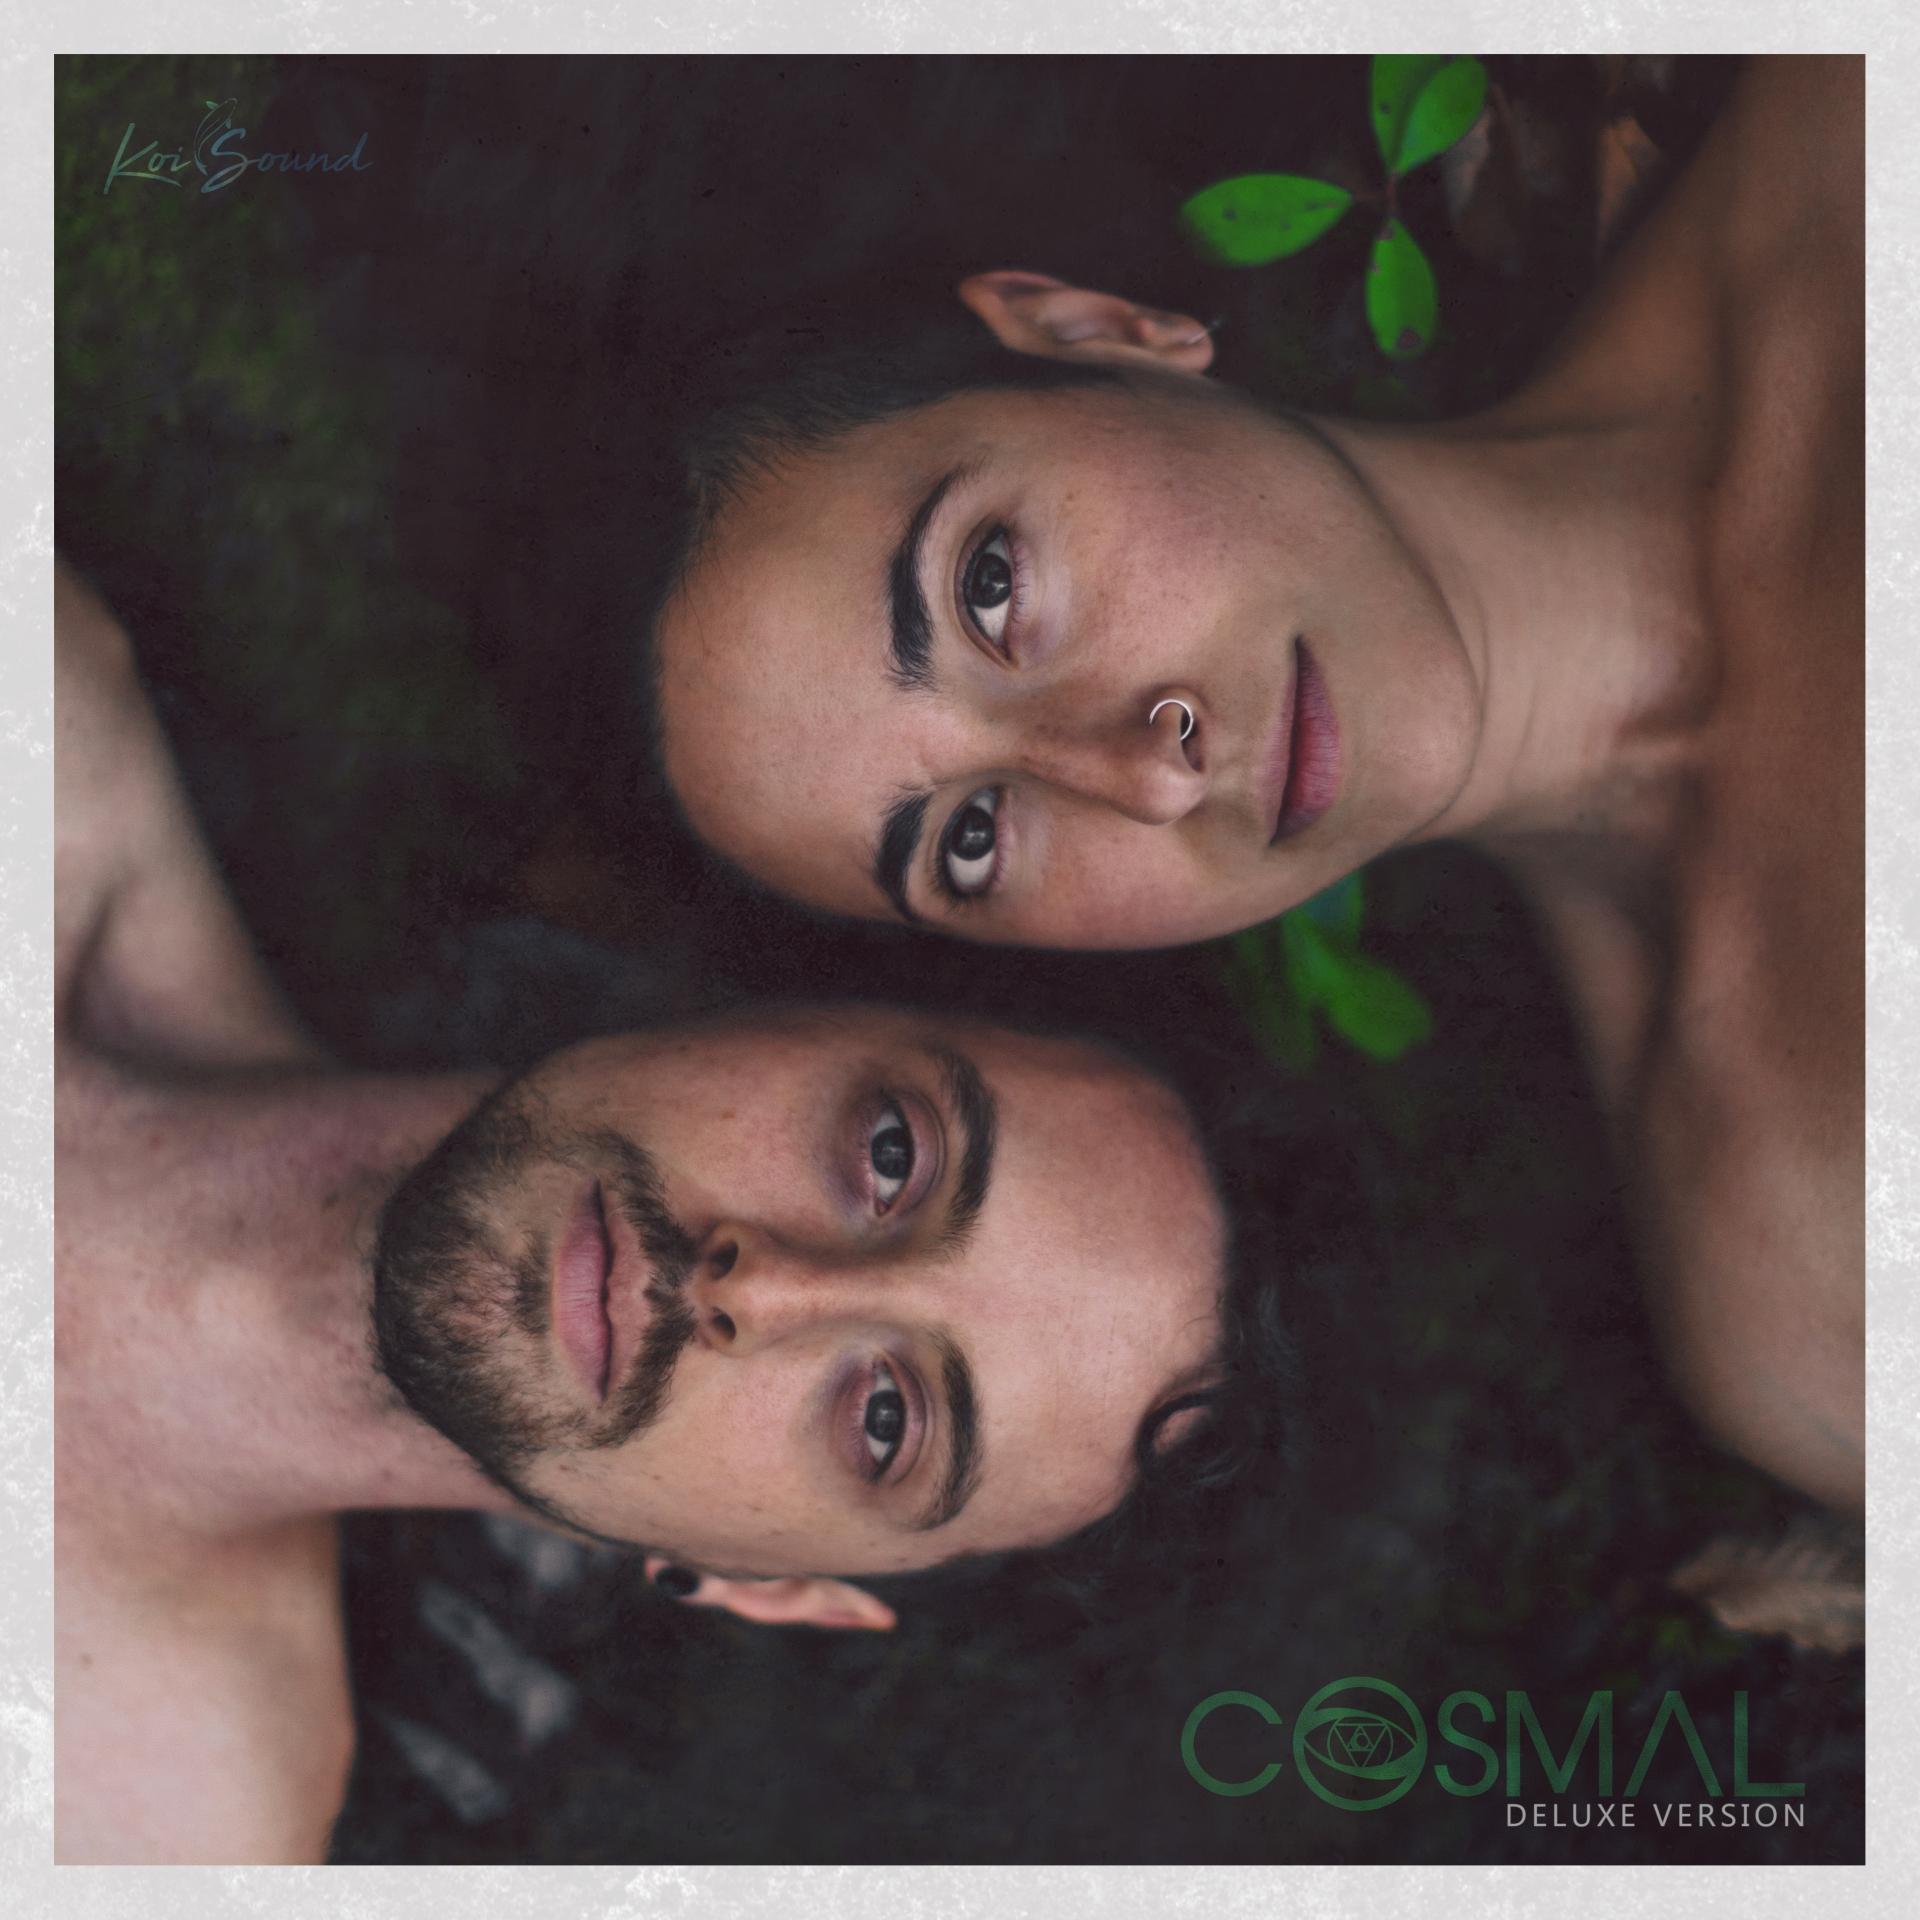 LPD - Cosmal - Live Music / Art Fusion